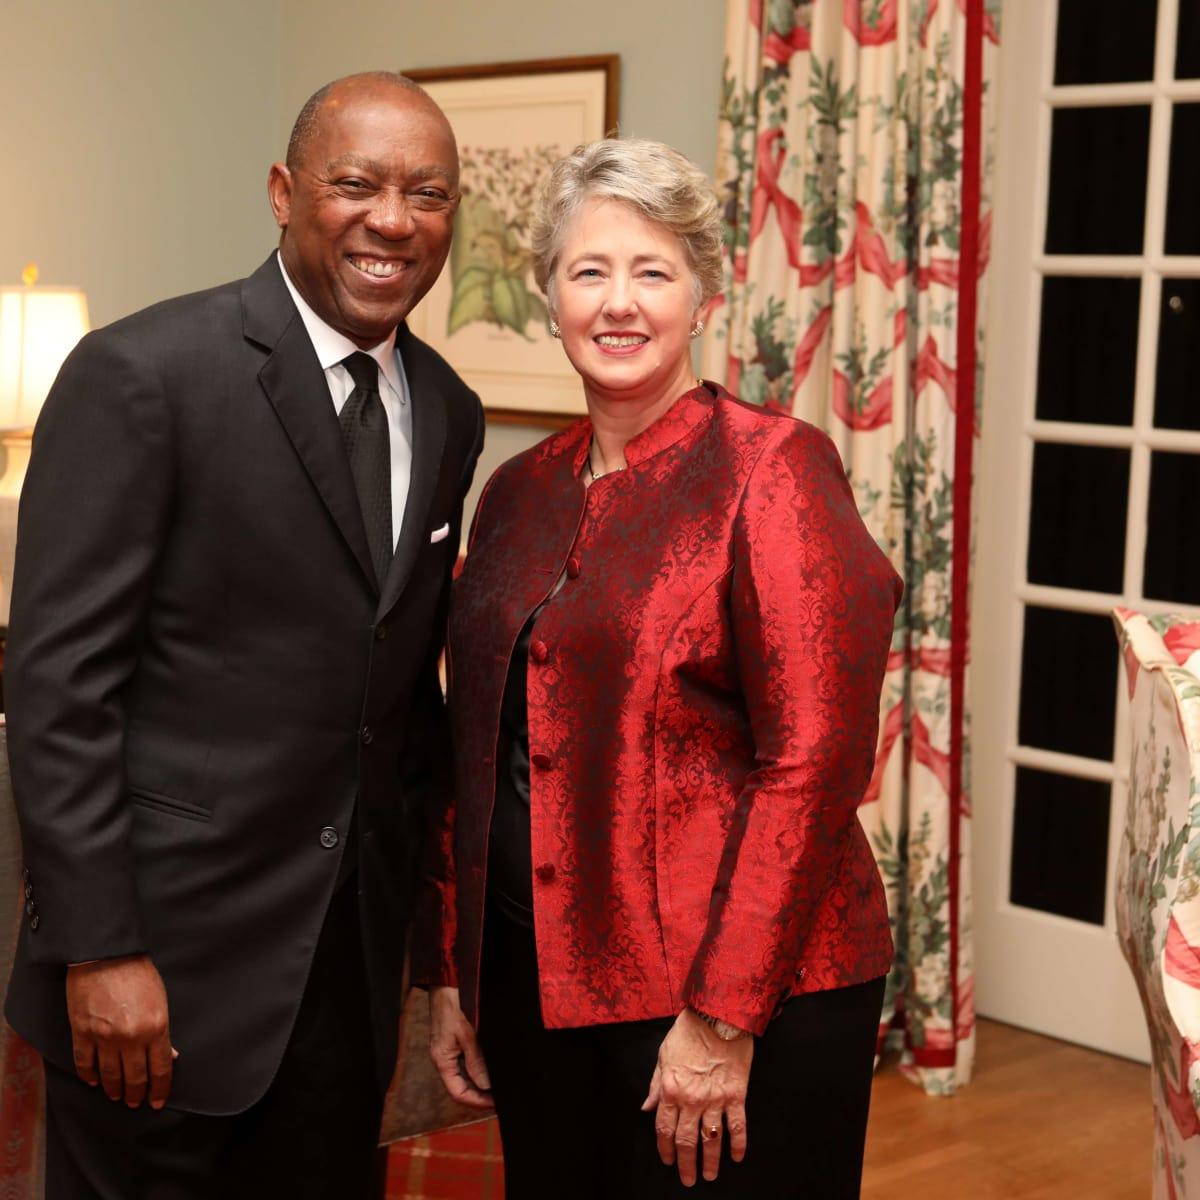 Houston, Barc Foundation's Barc On Broadway ball, Oct 2016, Mayor Sylvester Turner, Honorable Annise Parker